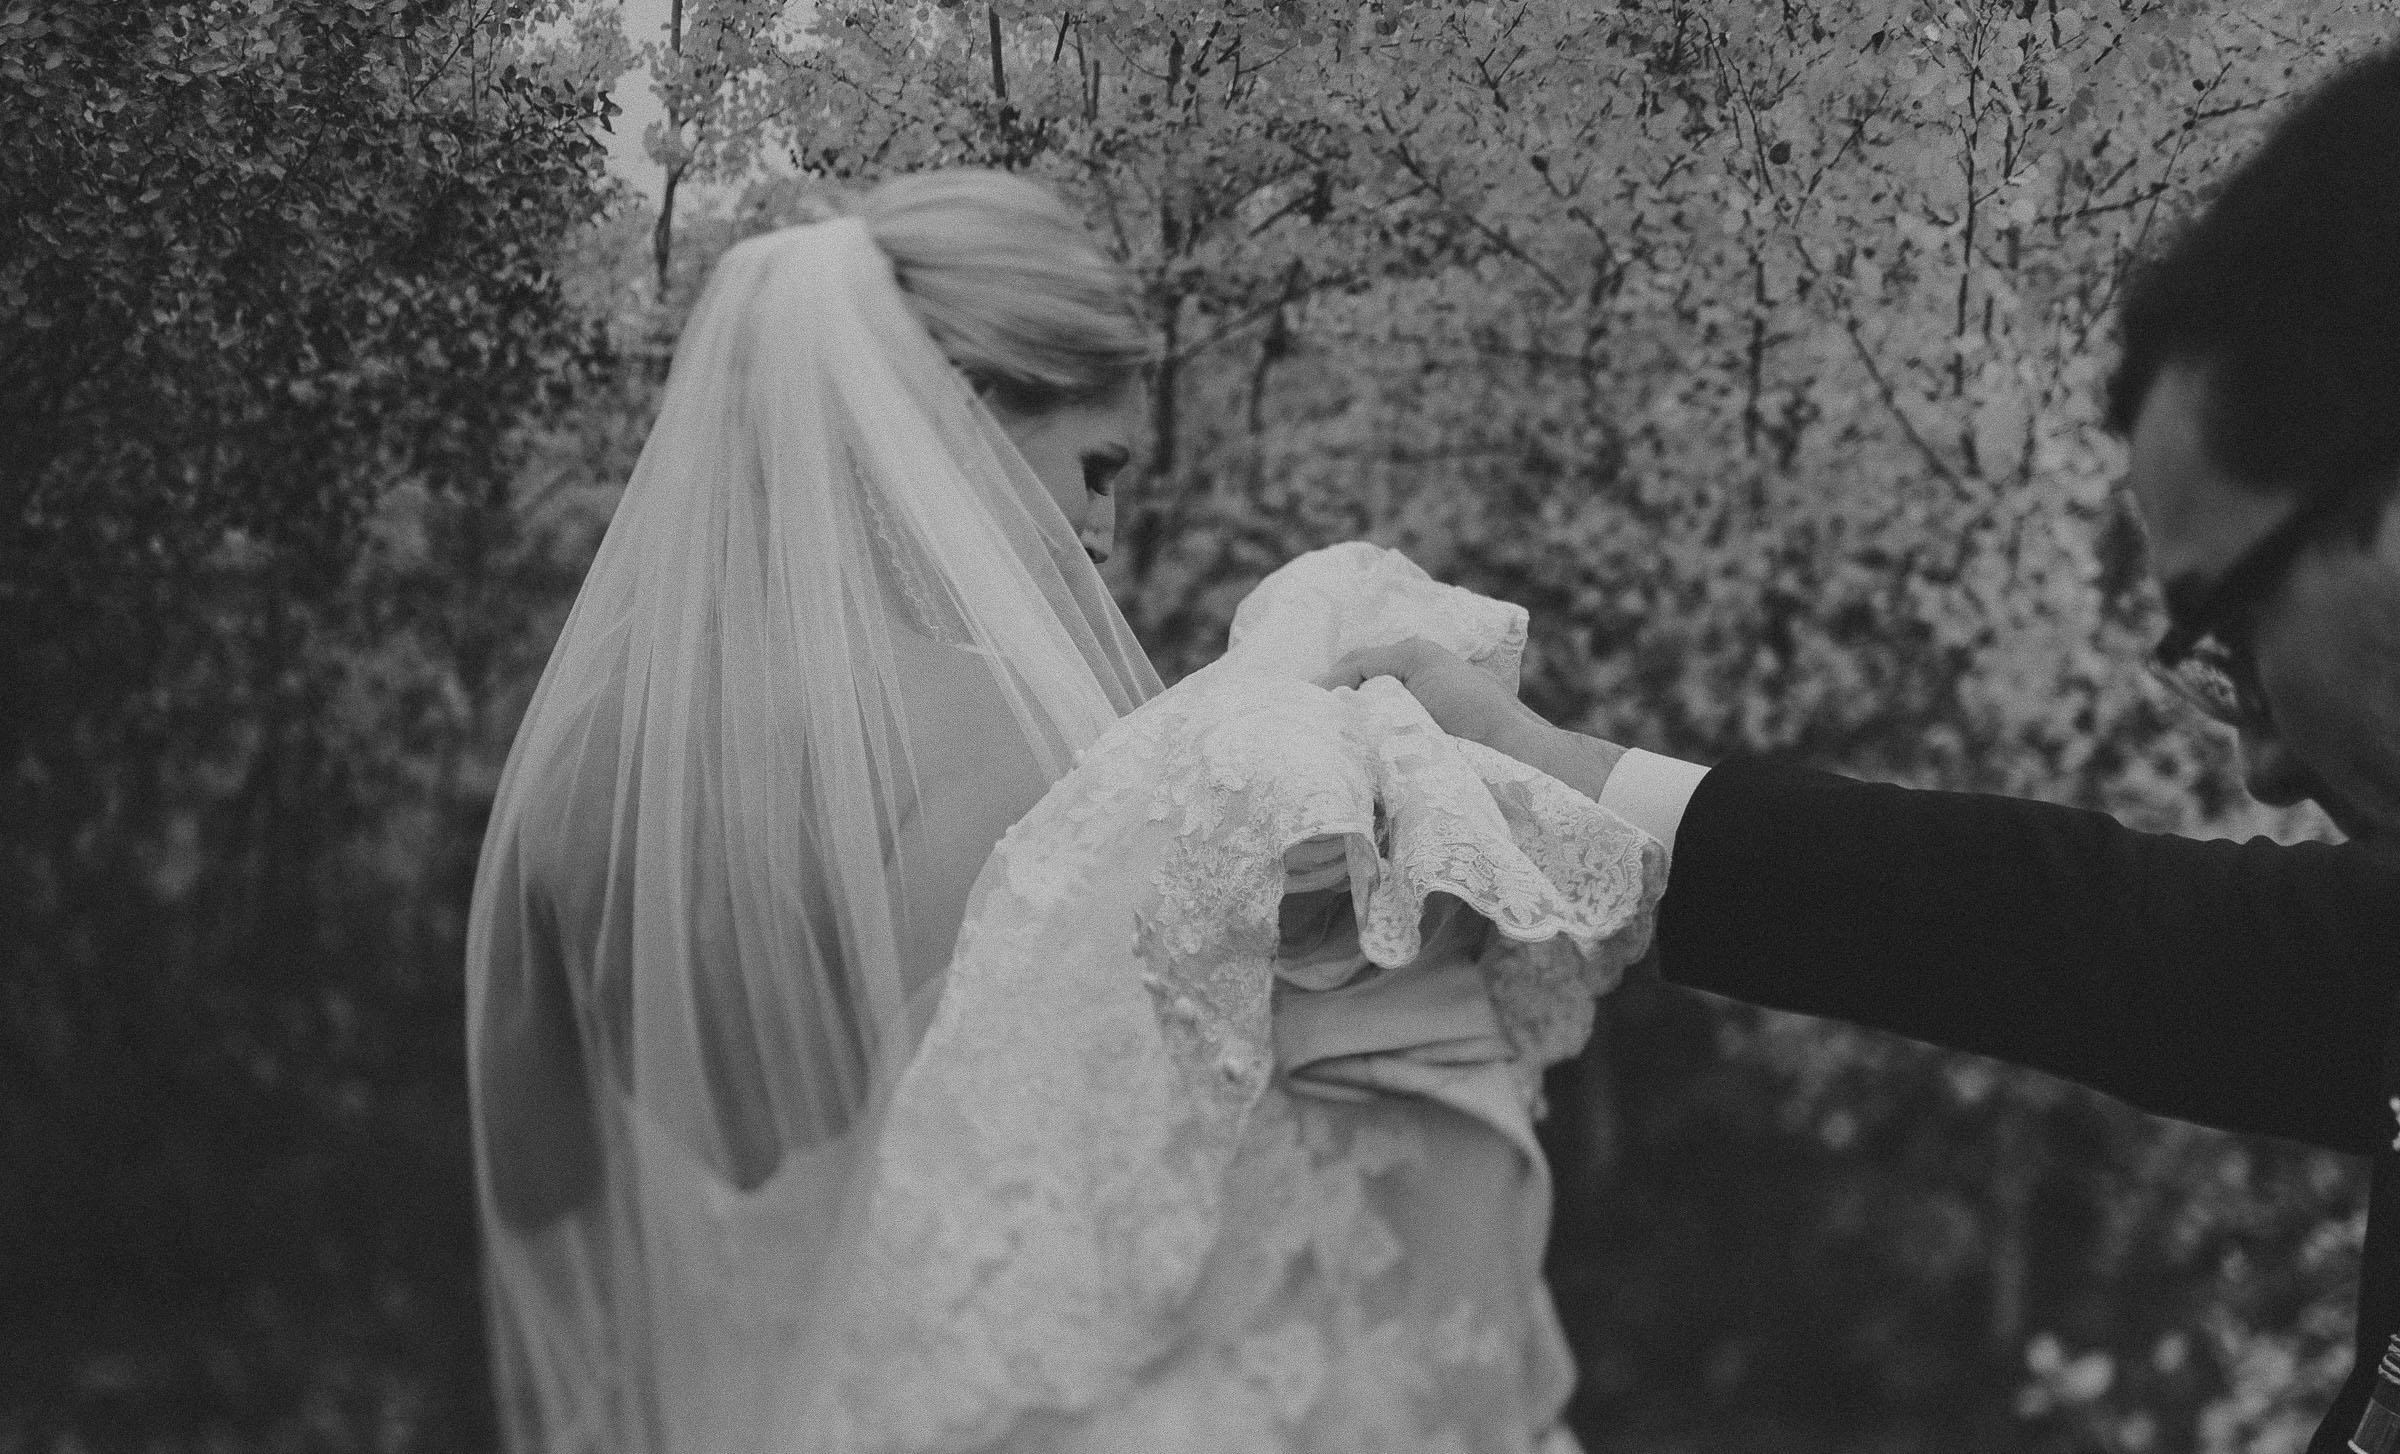 Lions-garden-wedding photographer